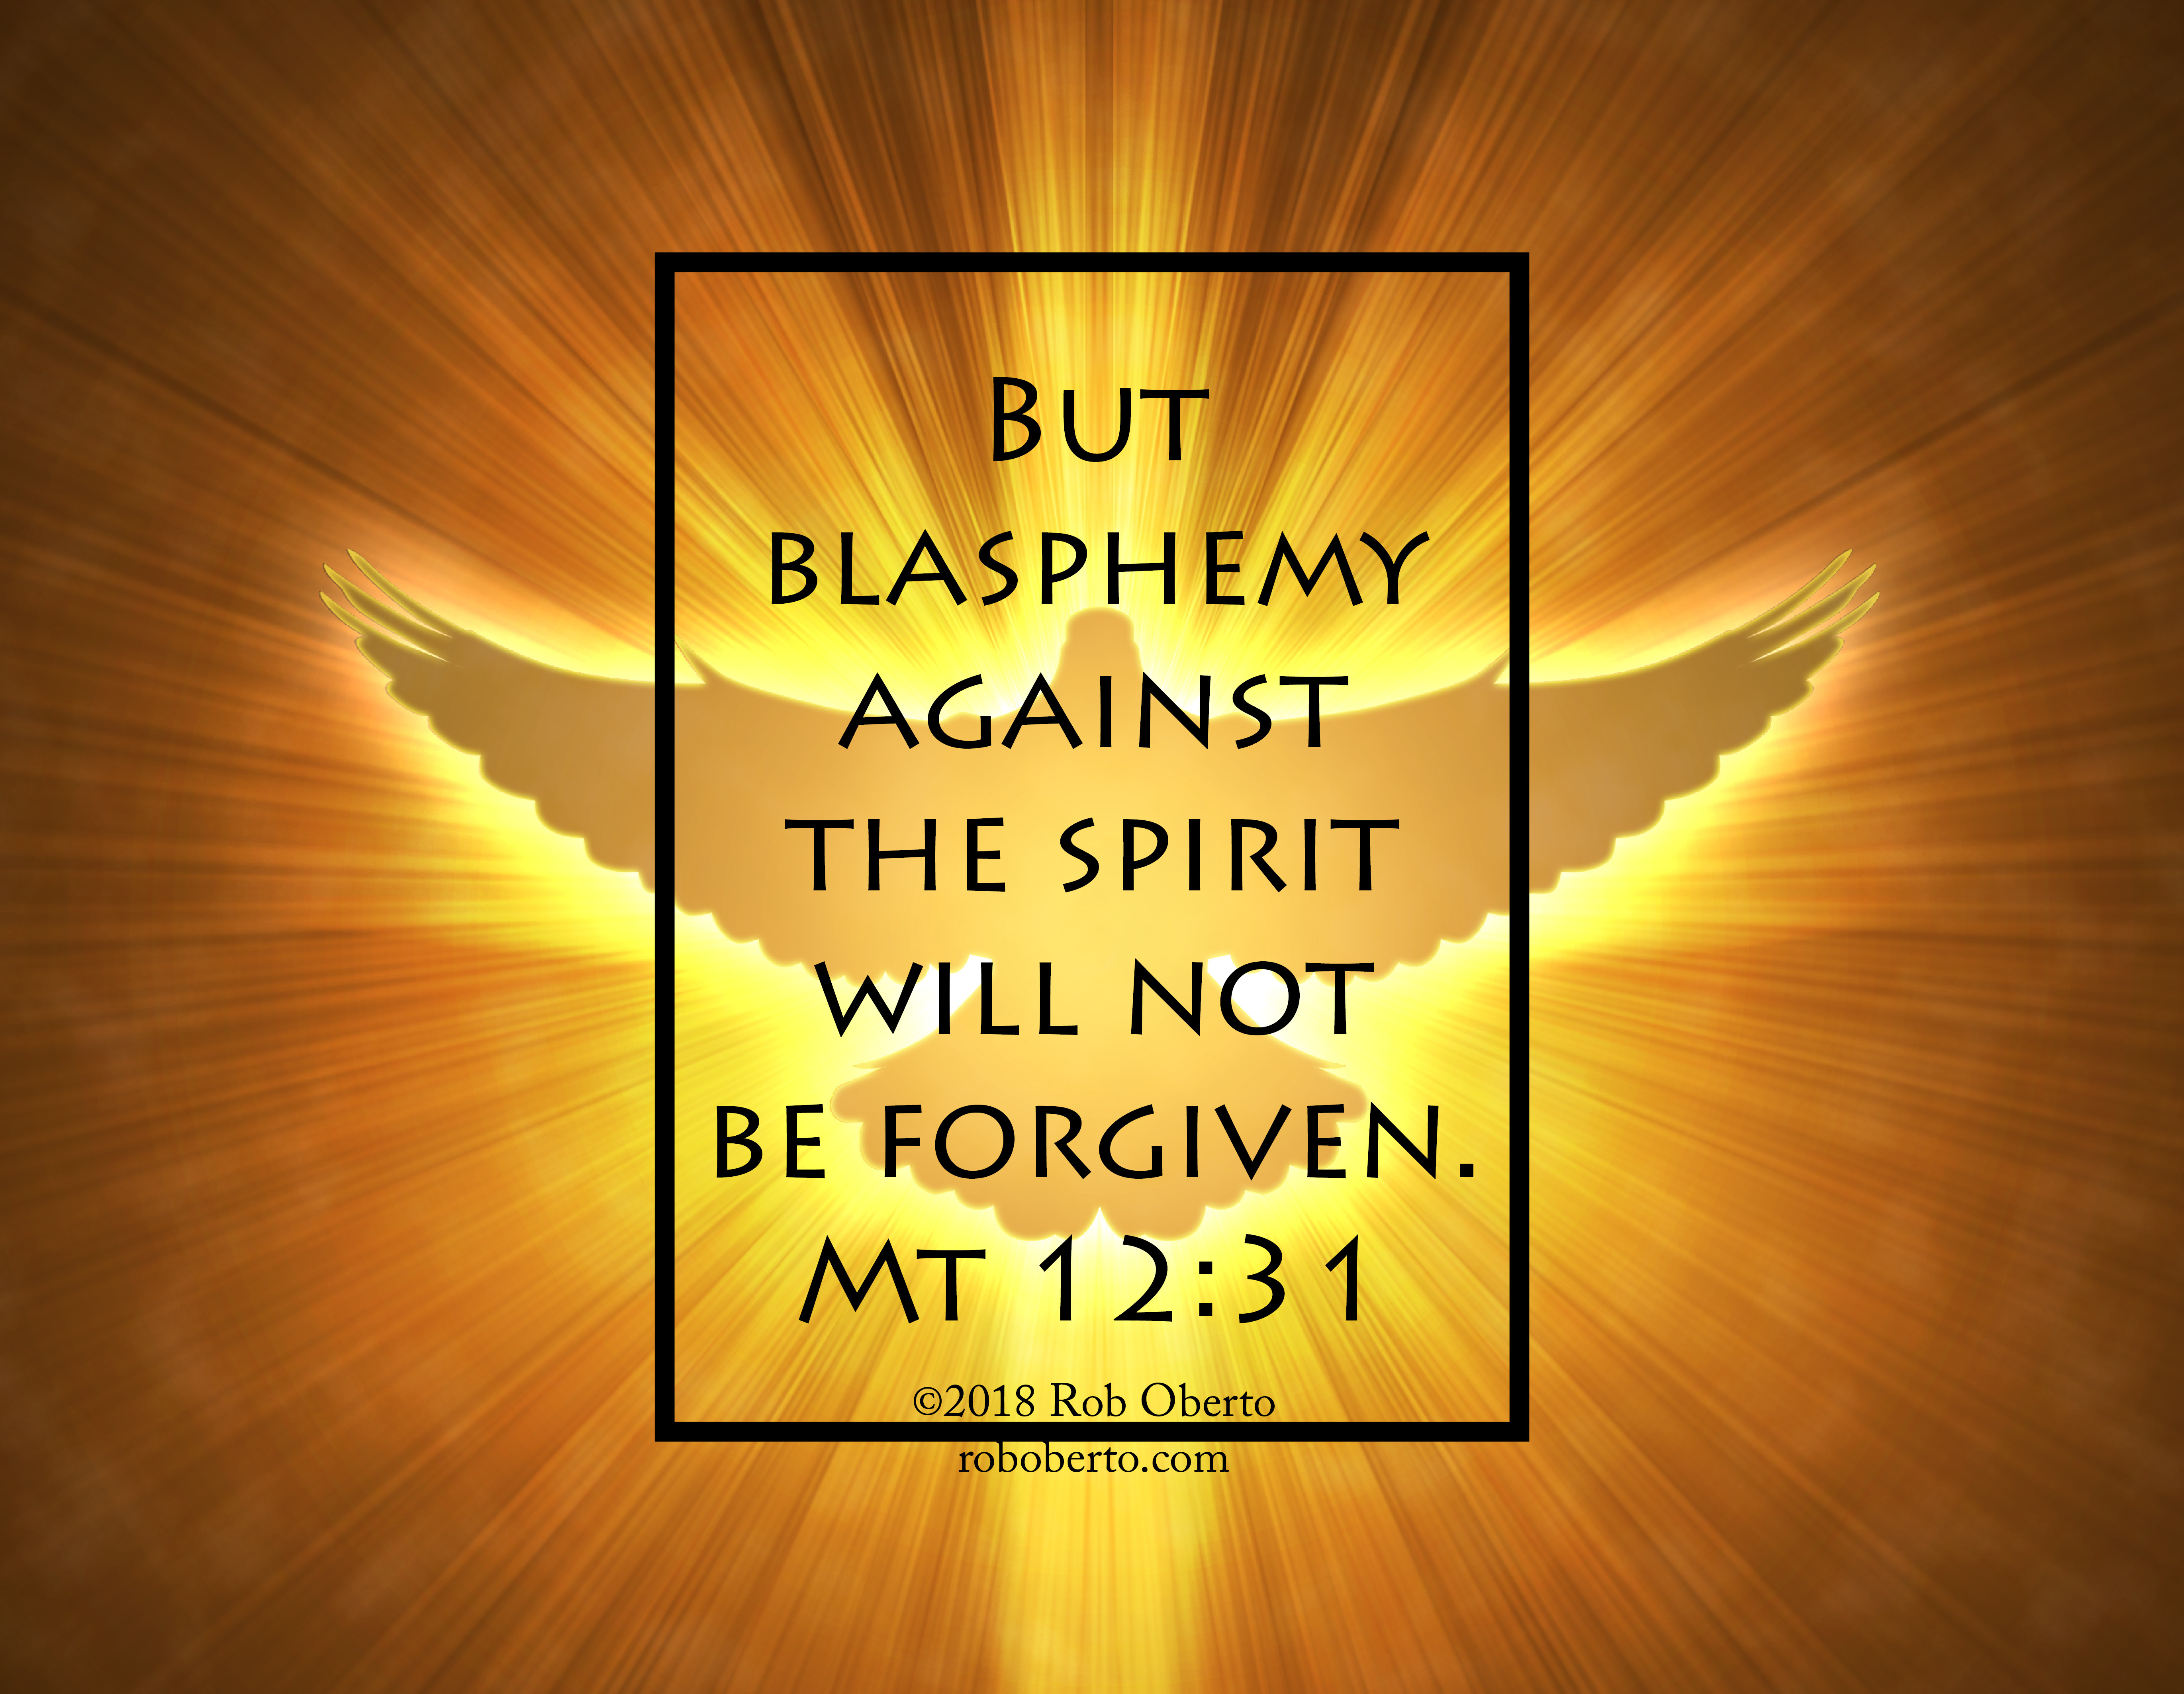 Holy Spirit_MergedLayers2